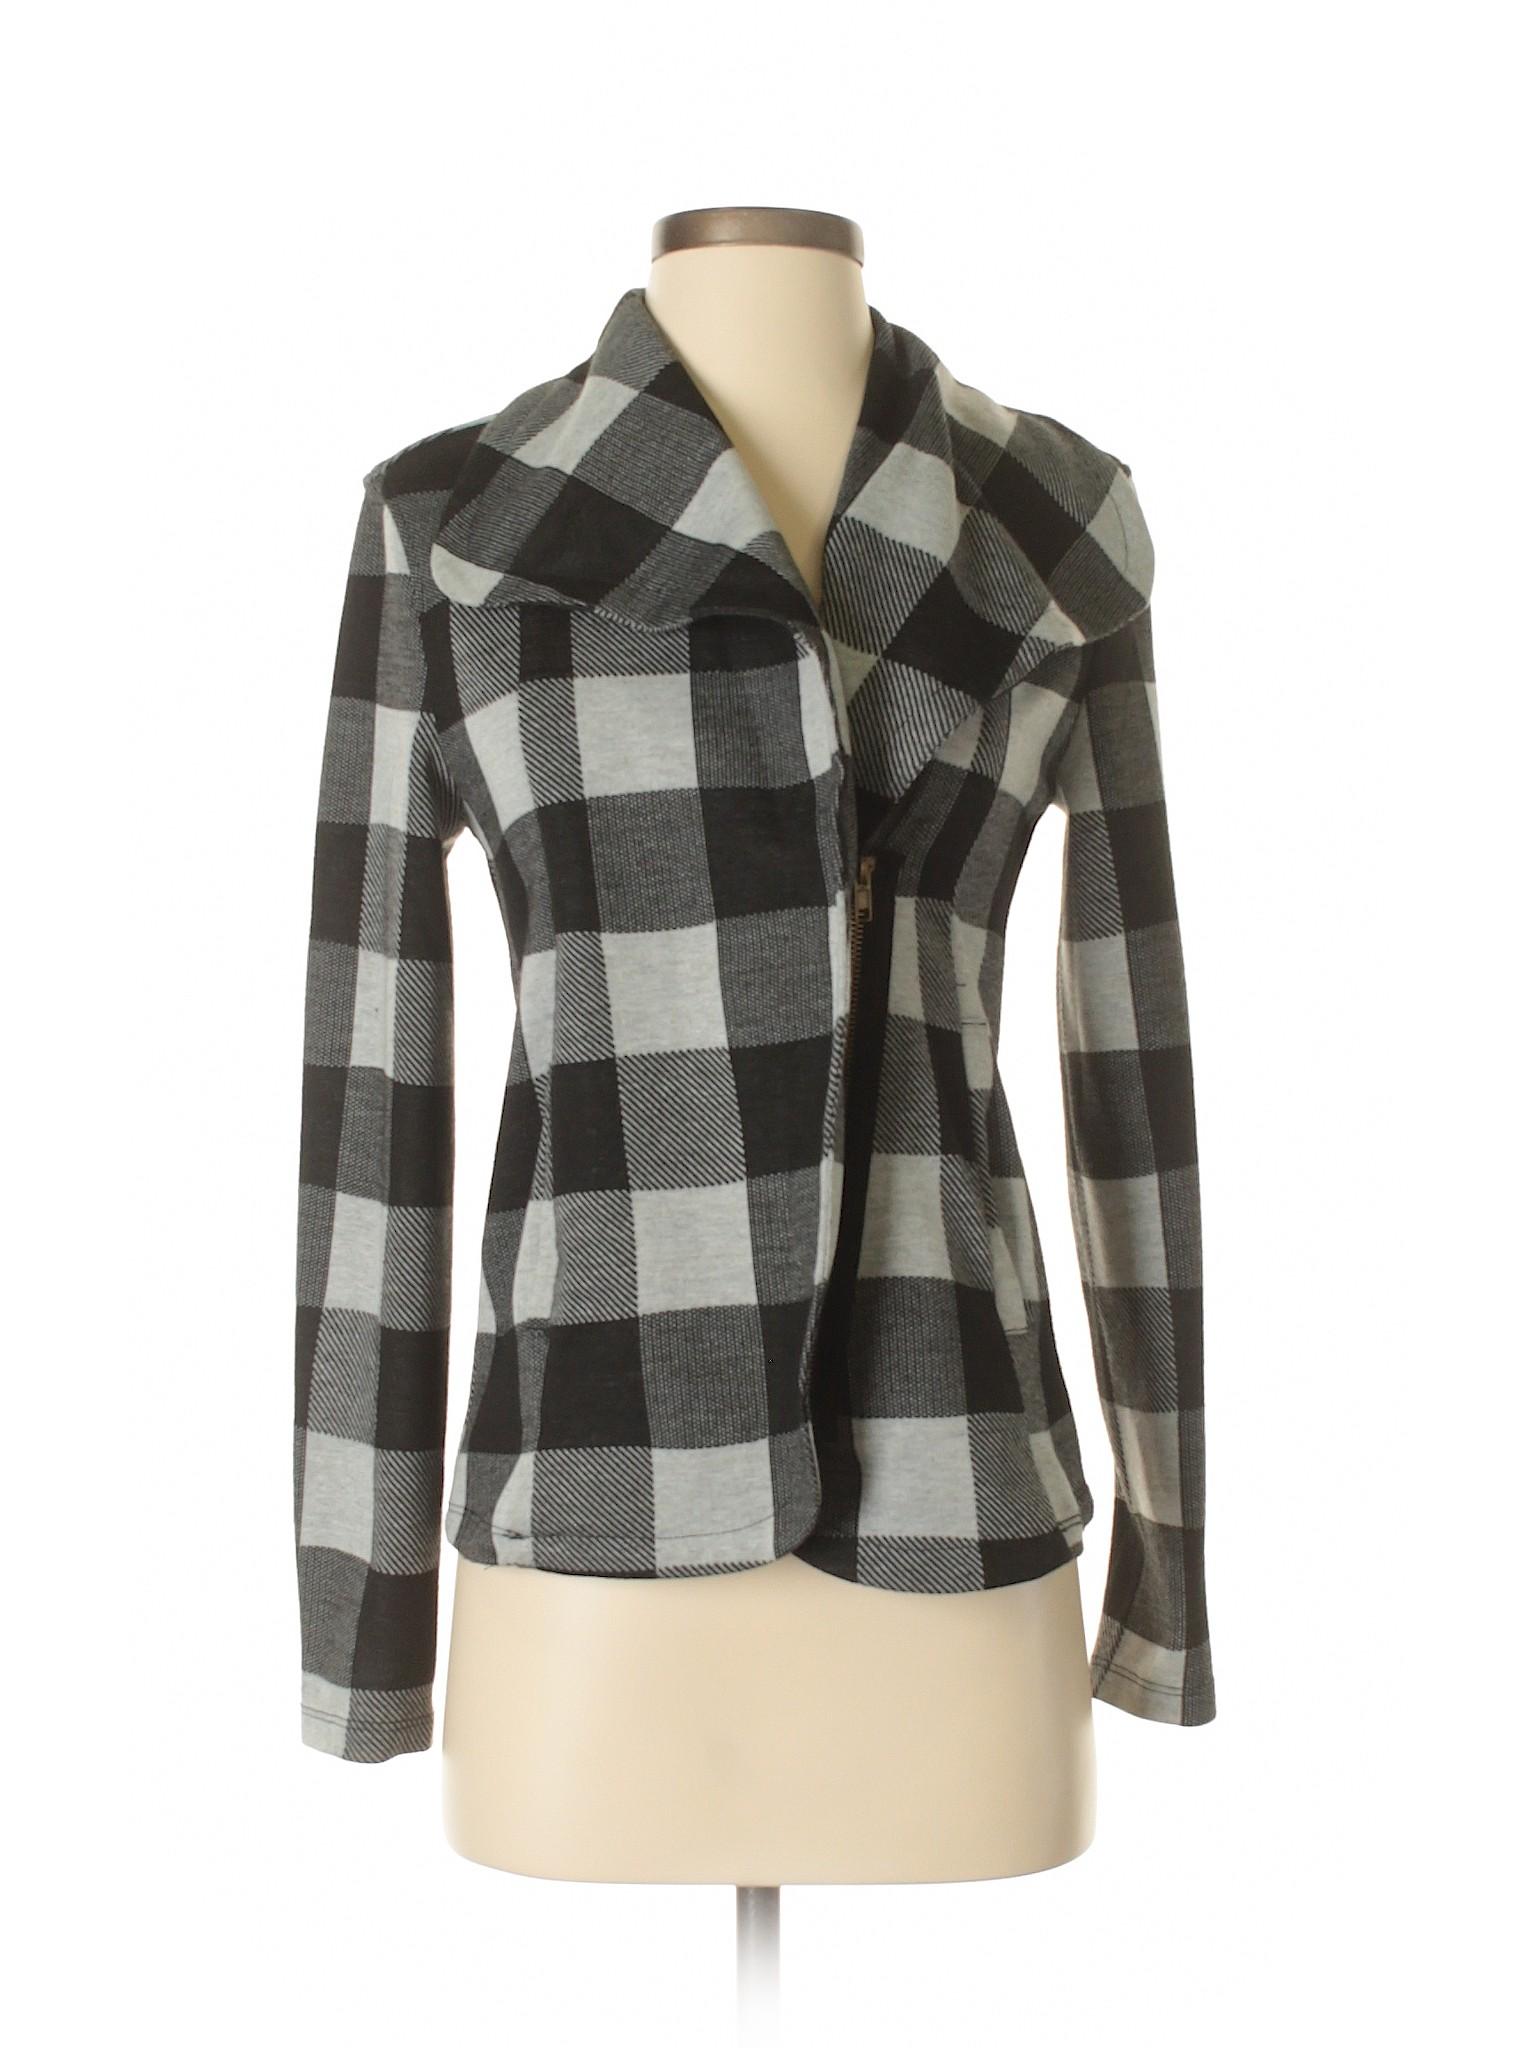 Blue Exclusively Jacket winter Fix Alice Boutique for Designed Stitch q1B7wxvw